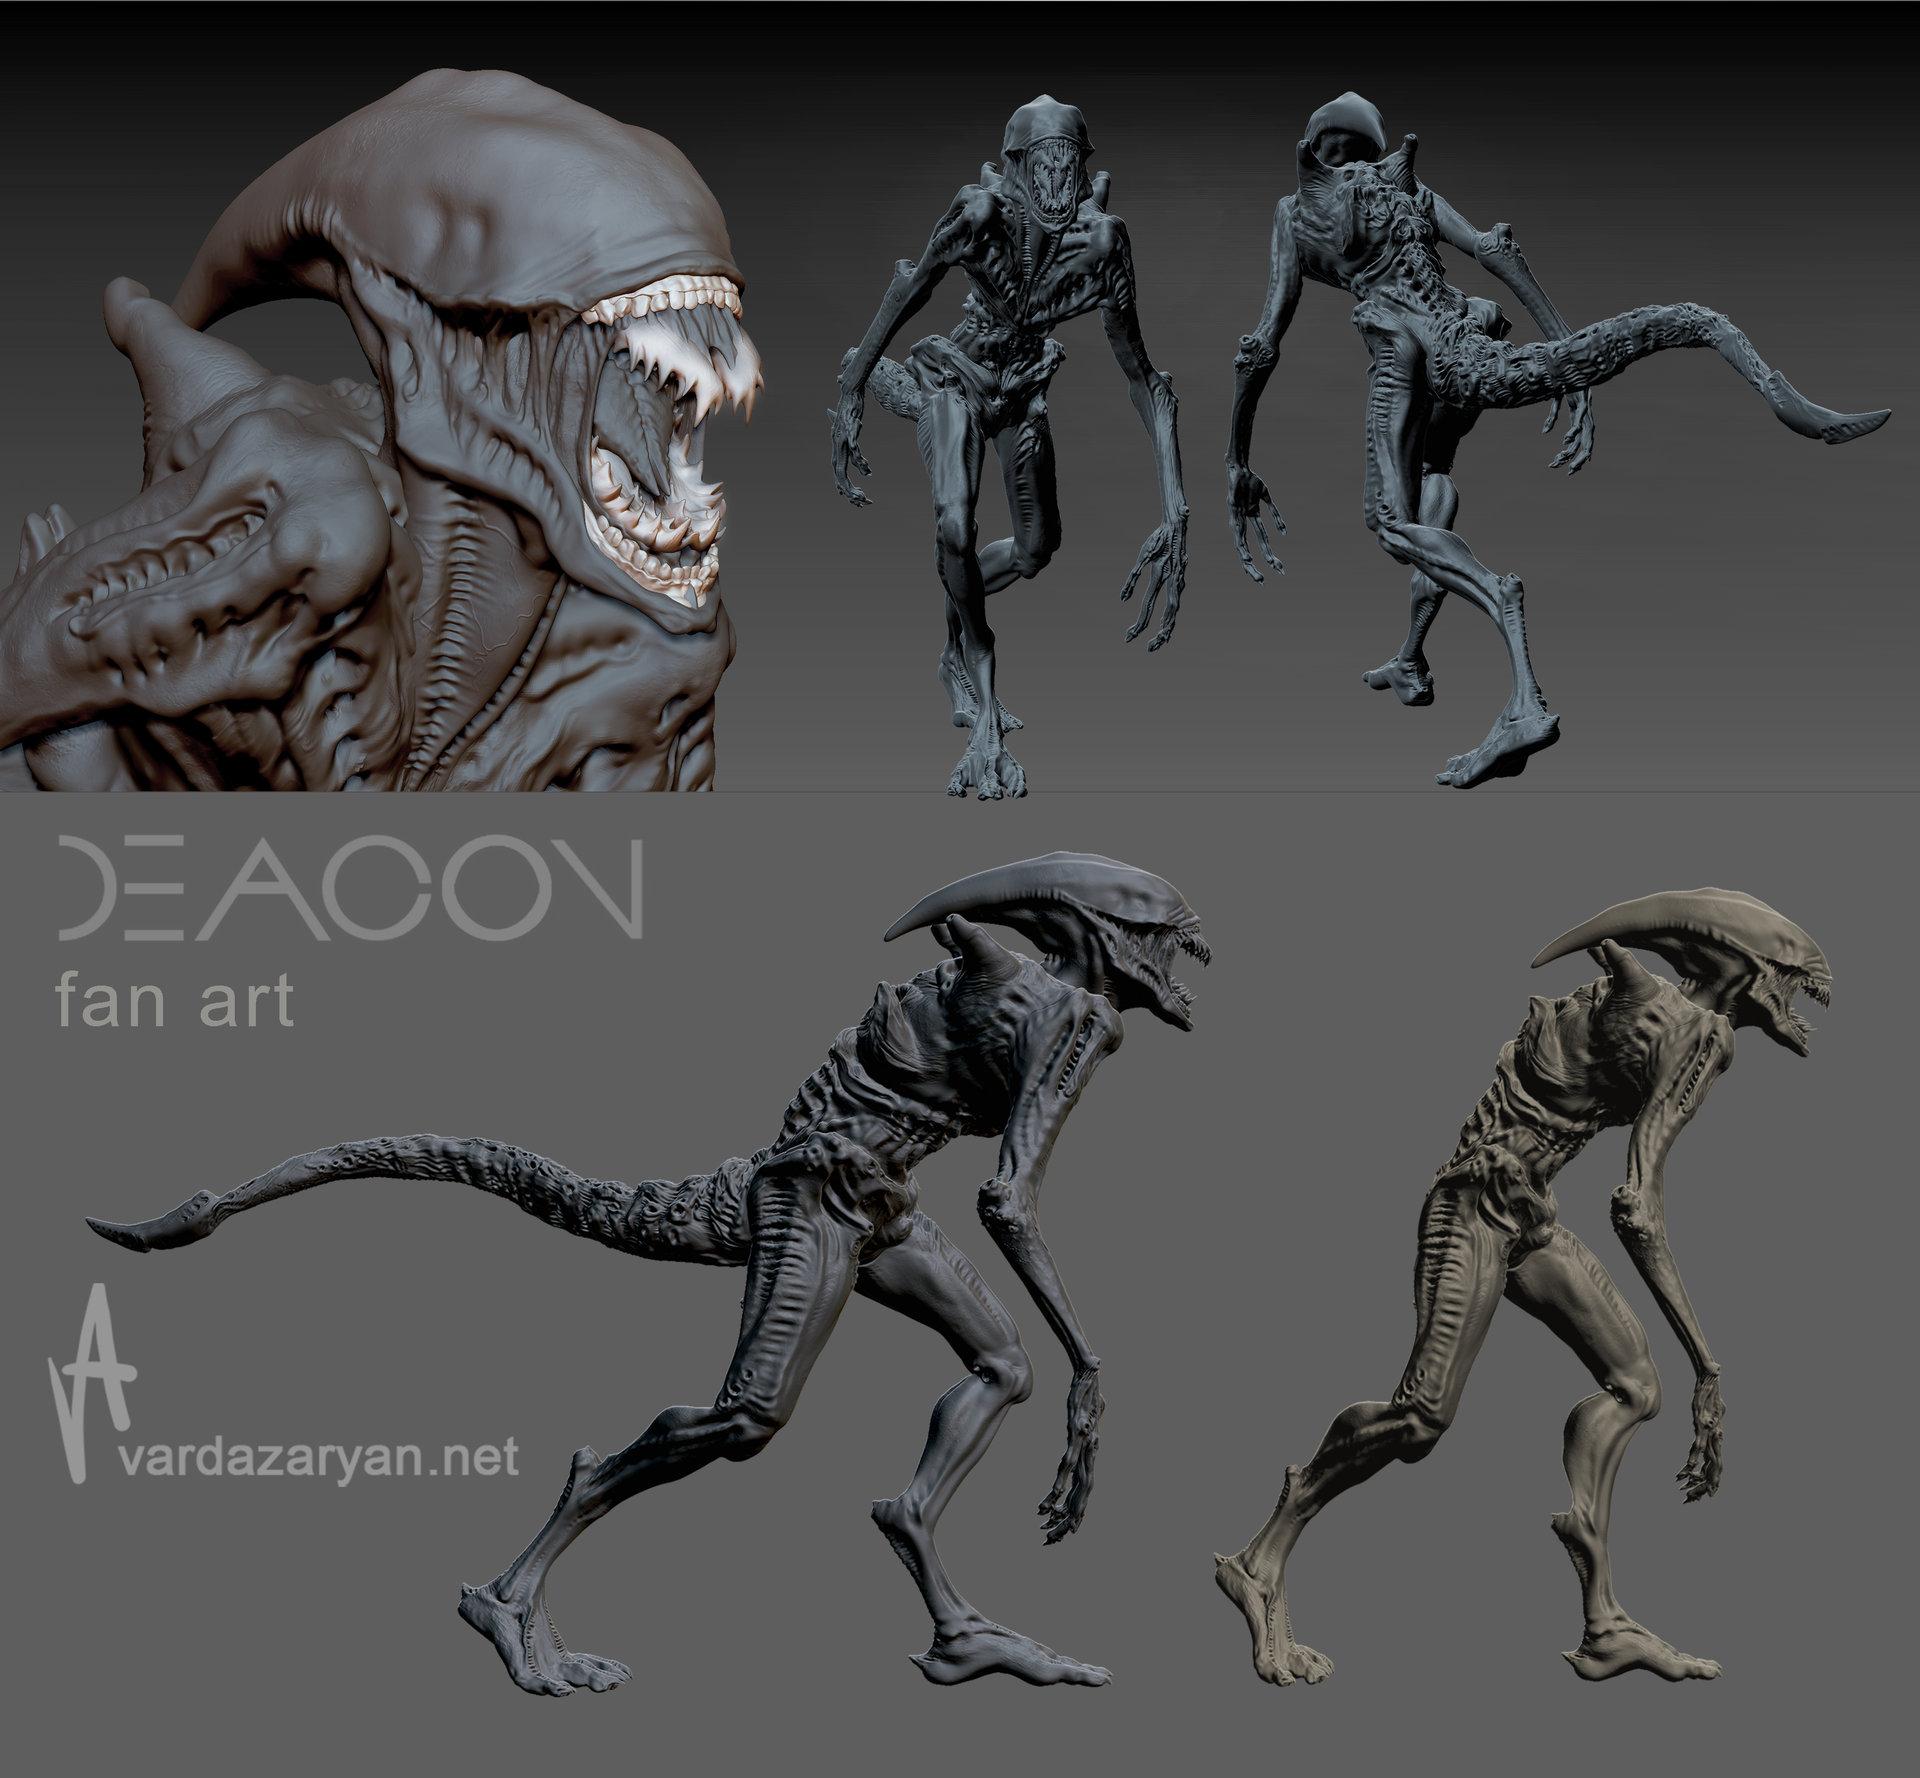 ArtStation - -Deacon-, Aram Vardazaryan